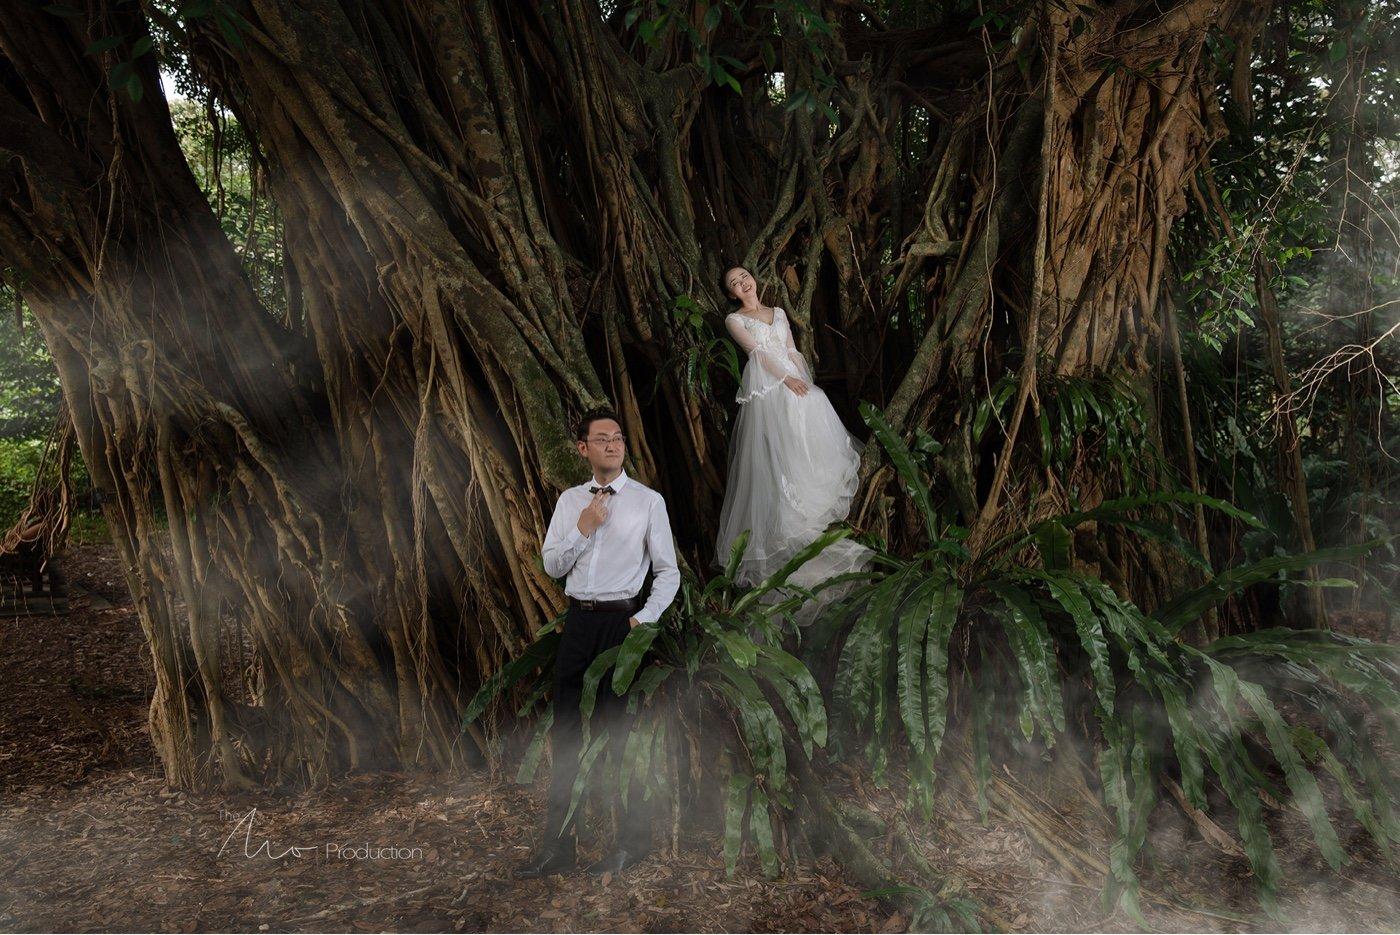 MoFoTo | 新加坡旅拍婚纱6